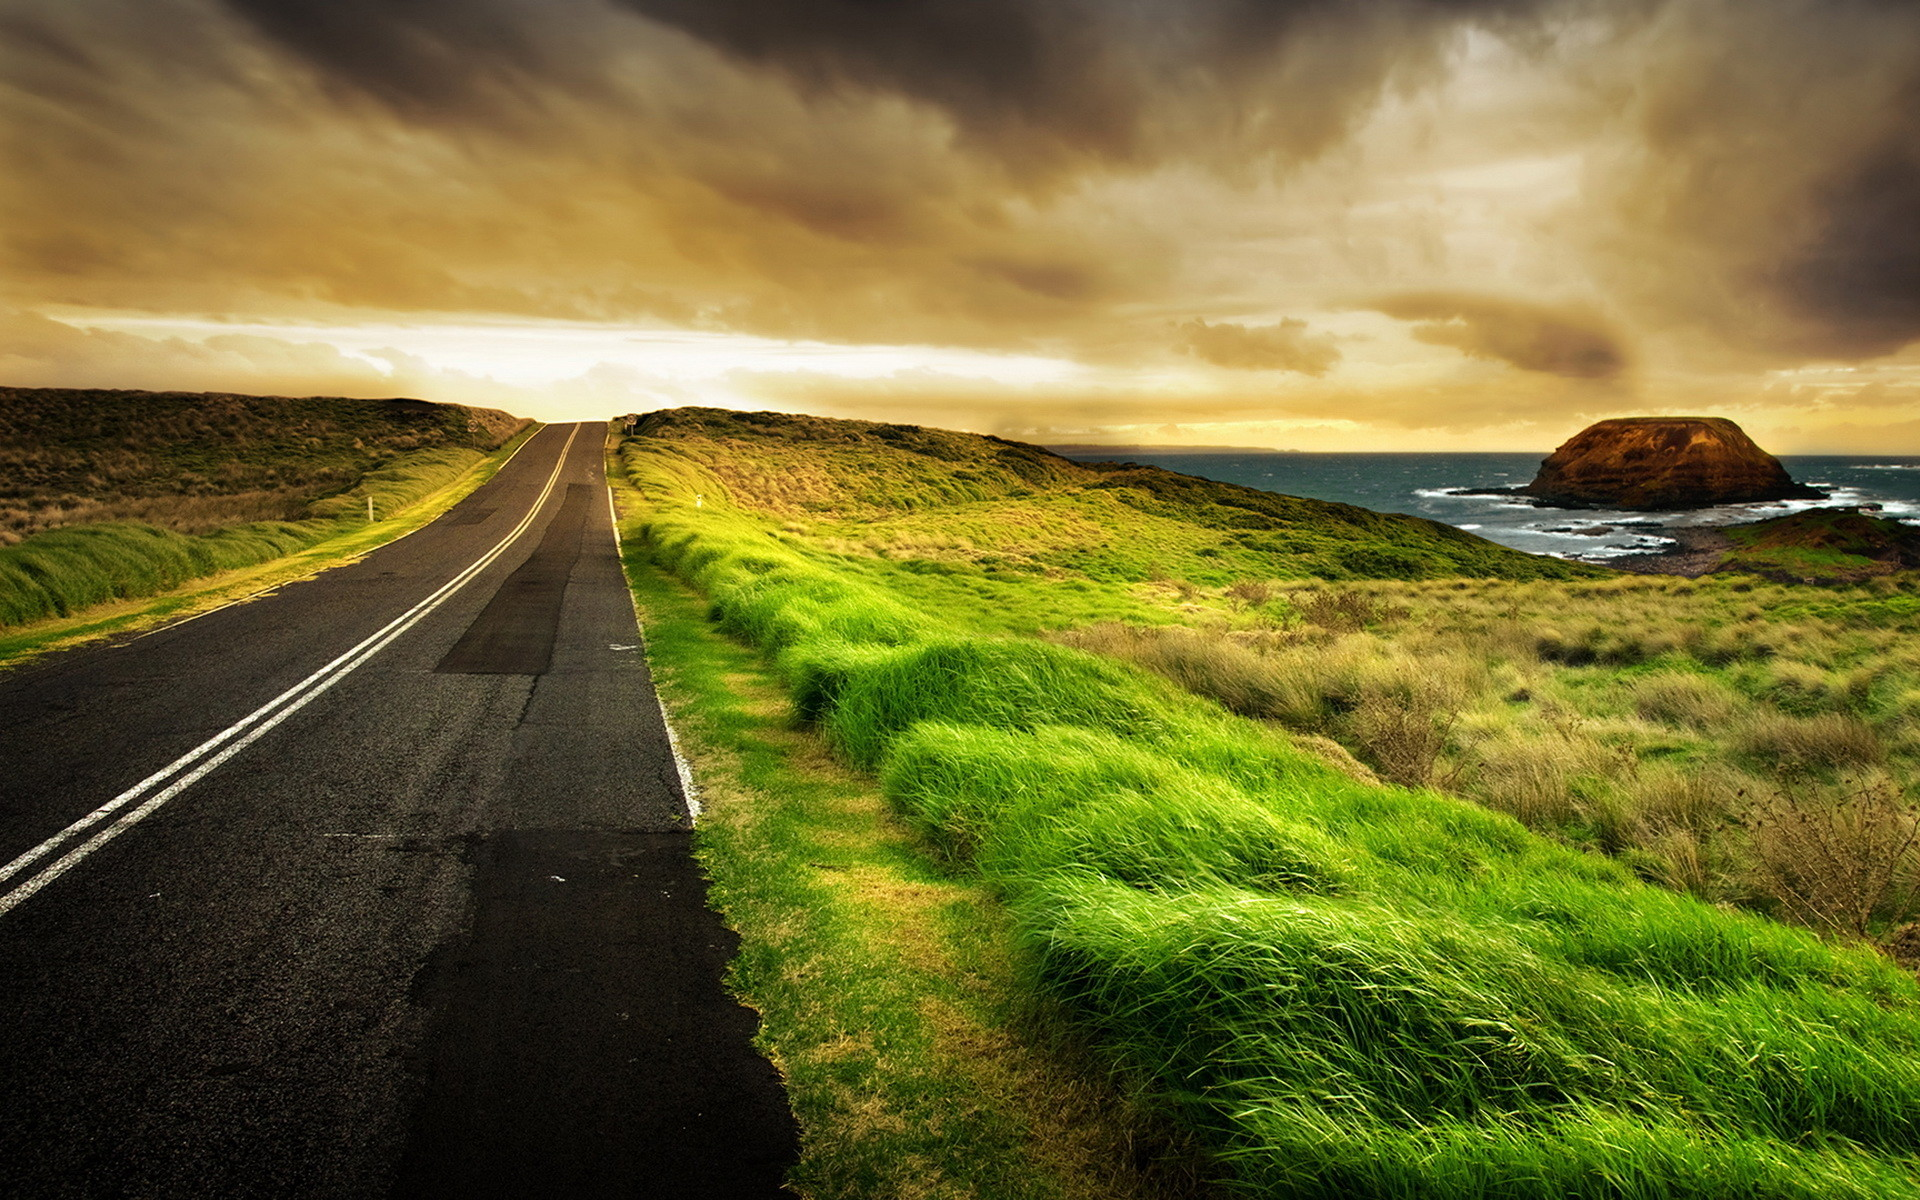 Amazing Landscape and Horizon HD Wallpaper